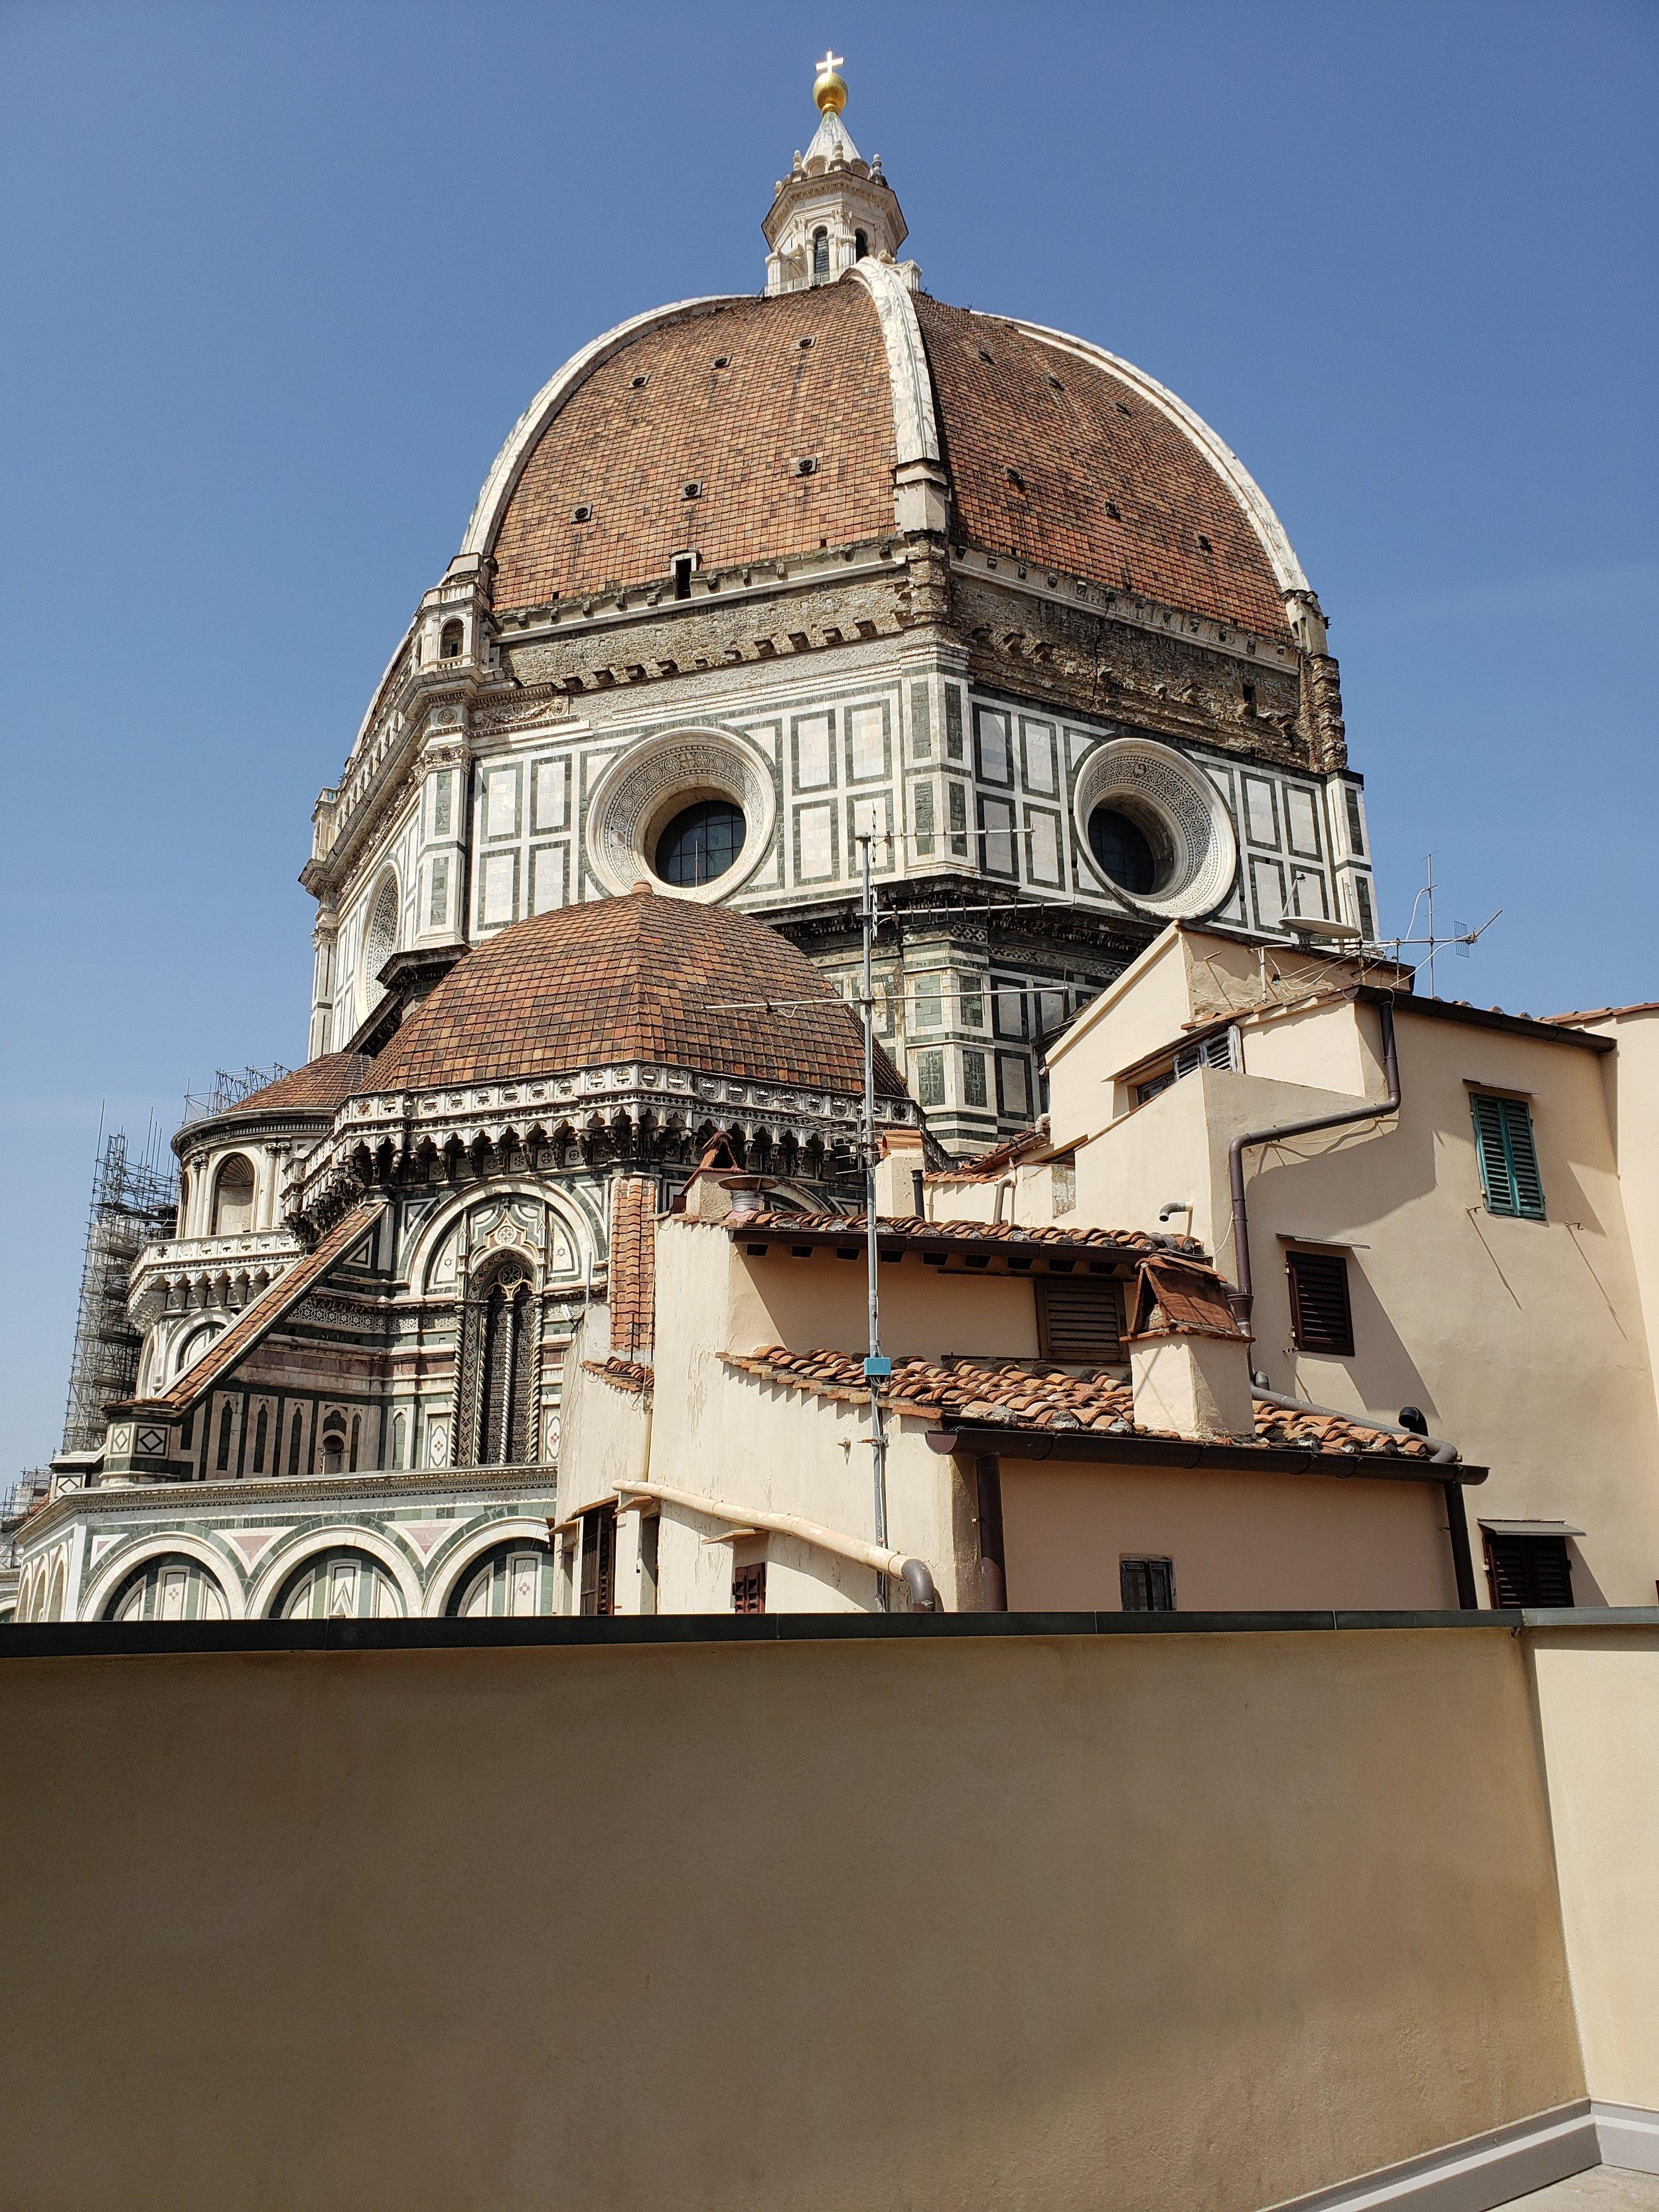 View of Brunelleschi's dome from the Museo dell'Opera del Duomo